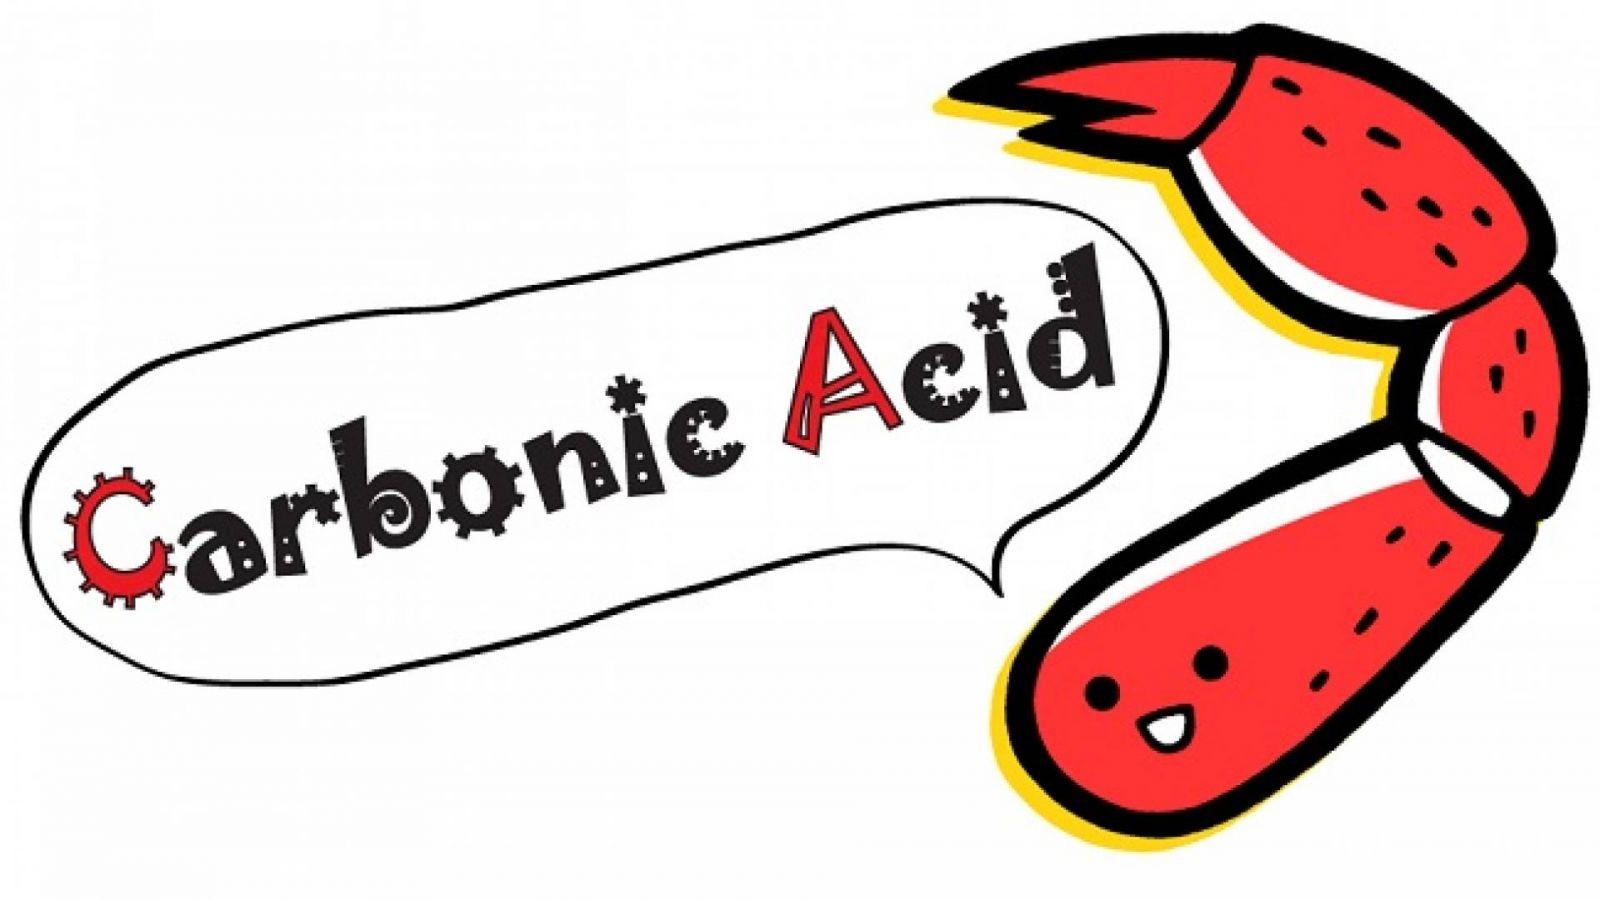 Segundo álbum do Carbonic Acid © Carbonic Acid